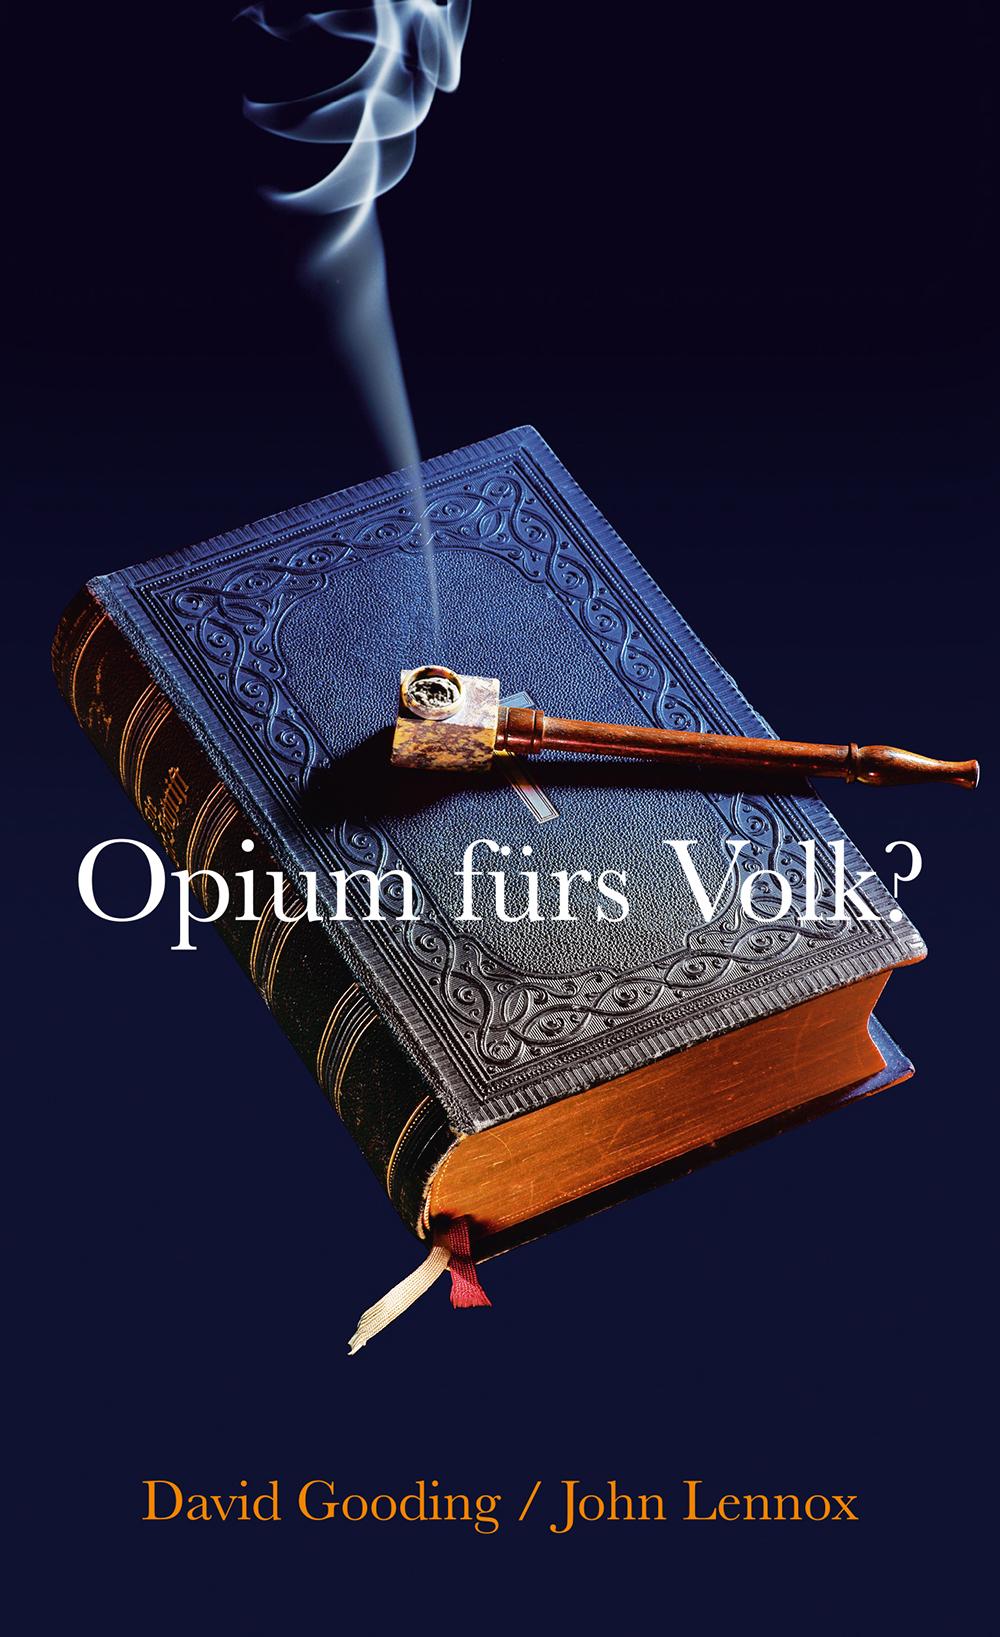 CLV_opium-fuers-volk_david-gooding-john-lennox_256151_1